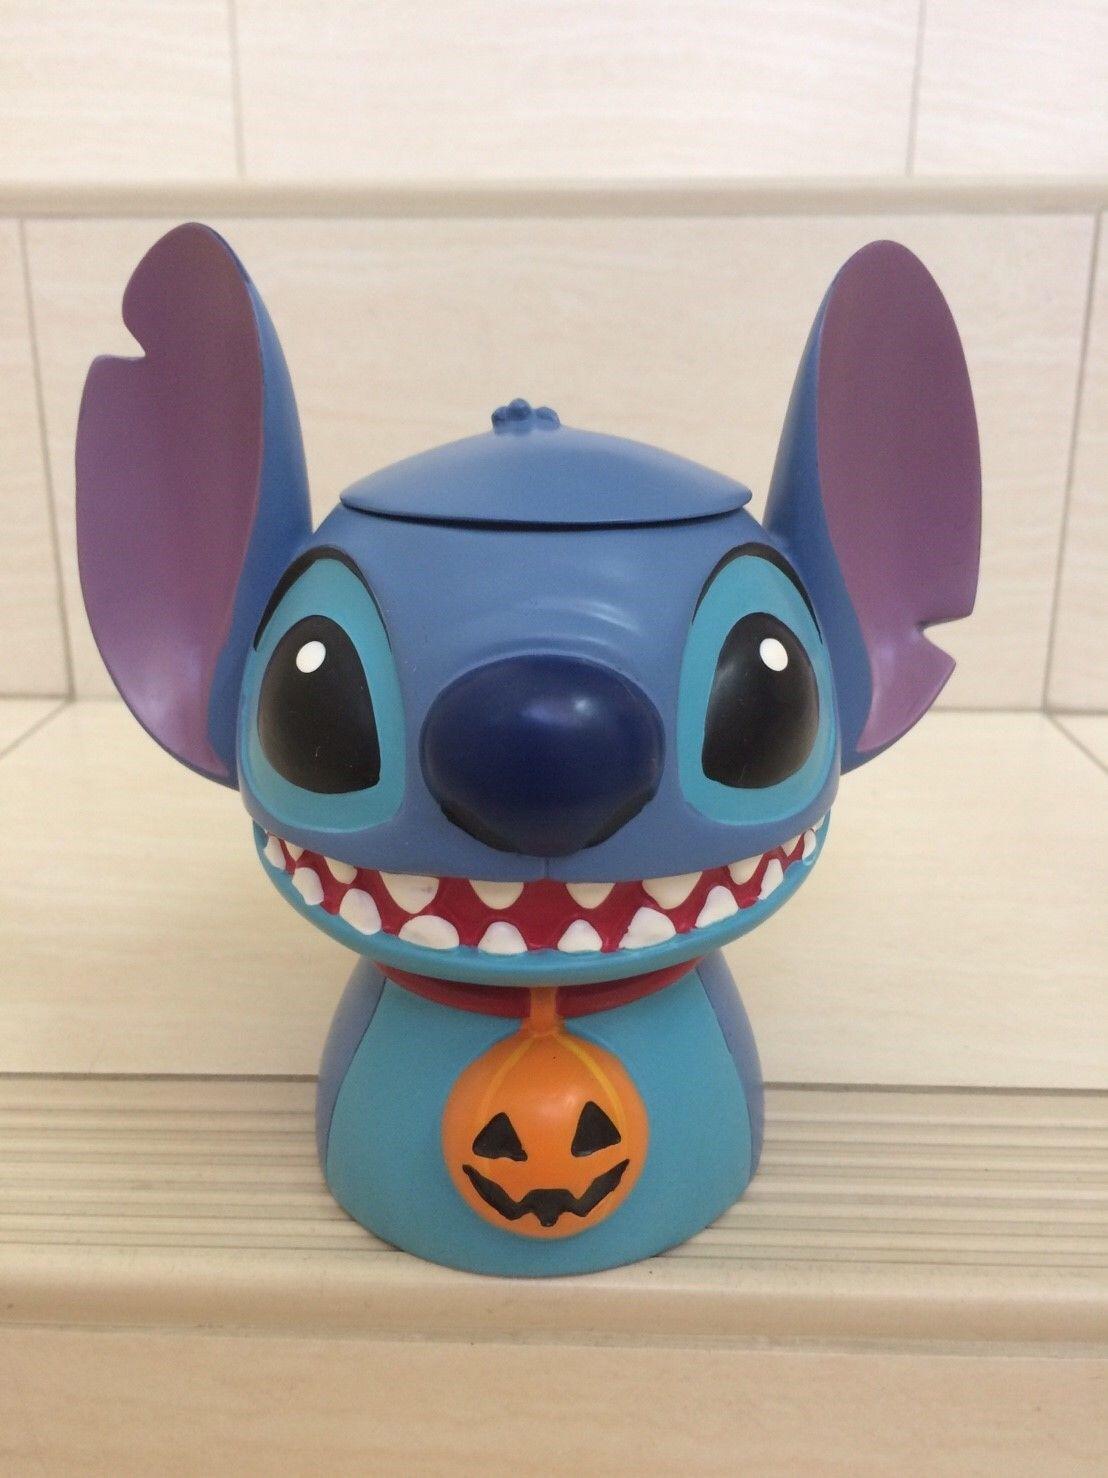 Disney Lilo Stitch Pen Holder or Accessory box. Halloween Theme. RARE collection - $69.99